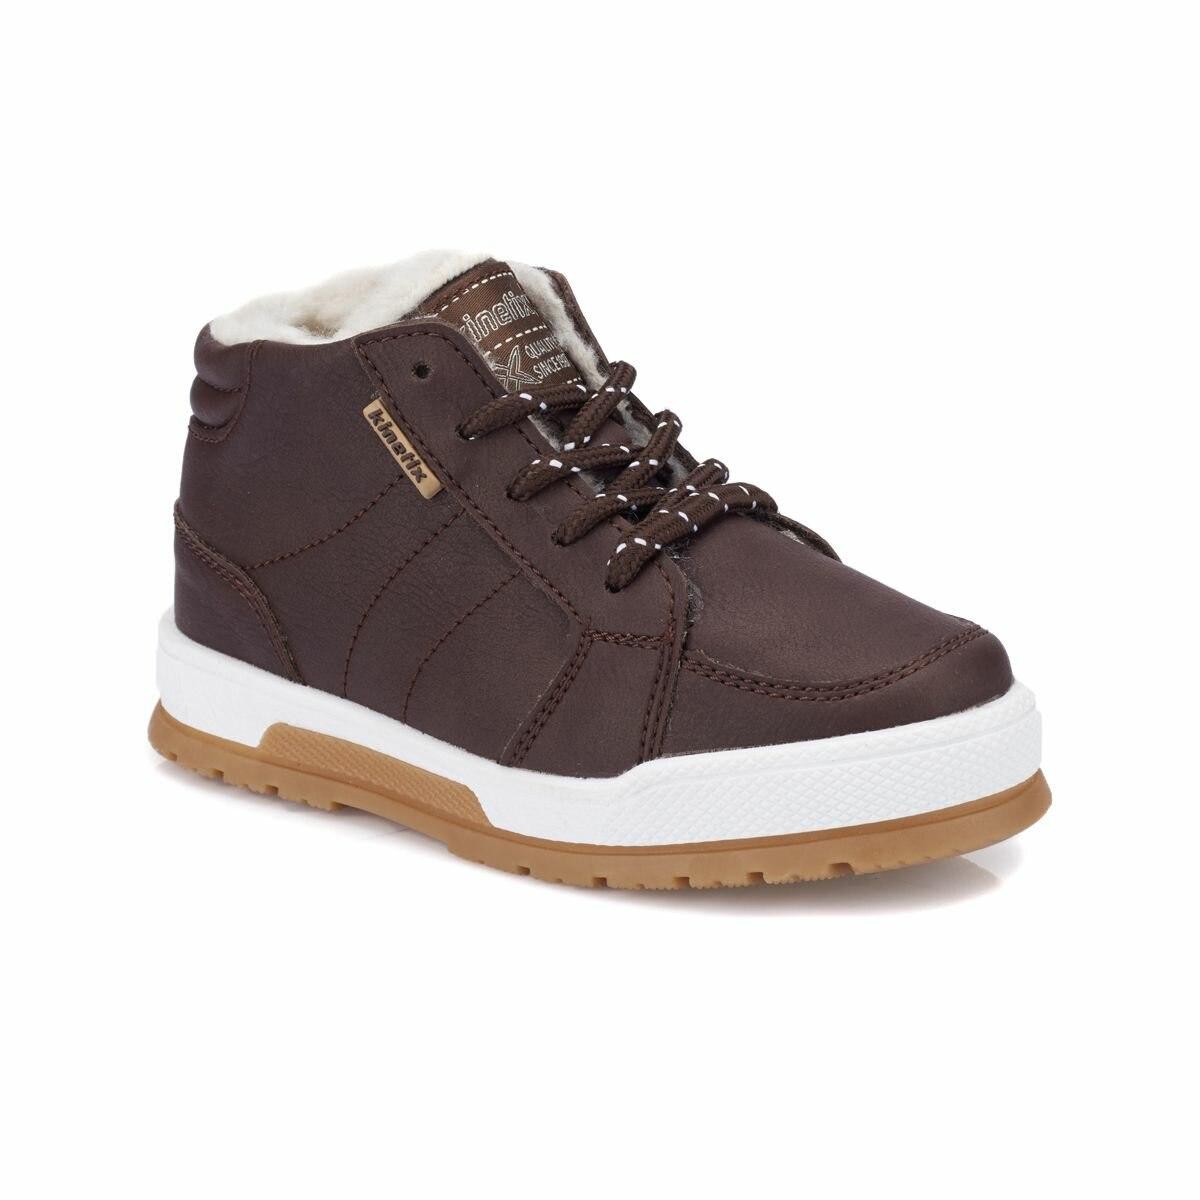 FLO VIDAL Brown Male Child Sneaker Shoes KINETIX